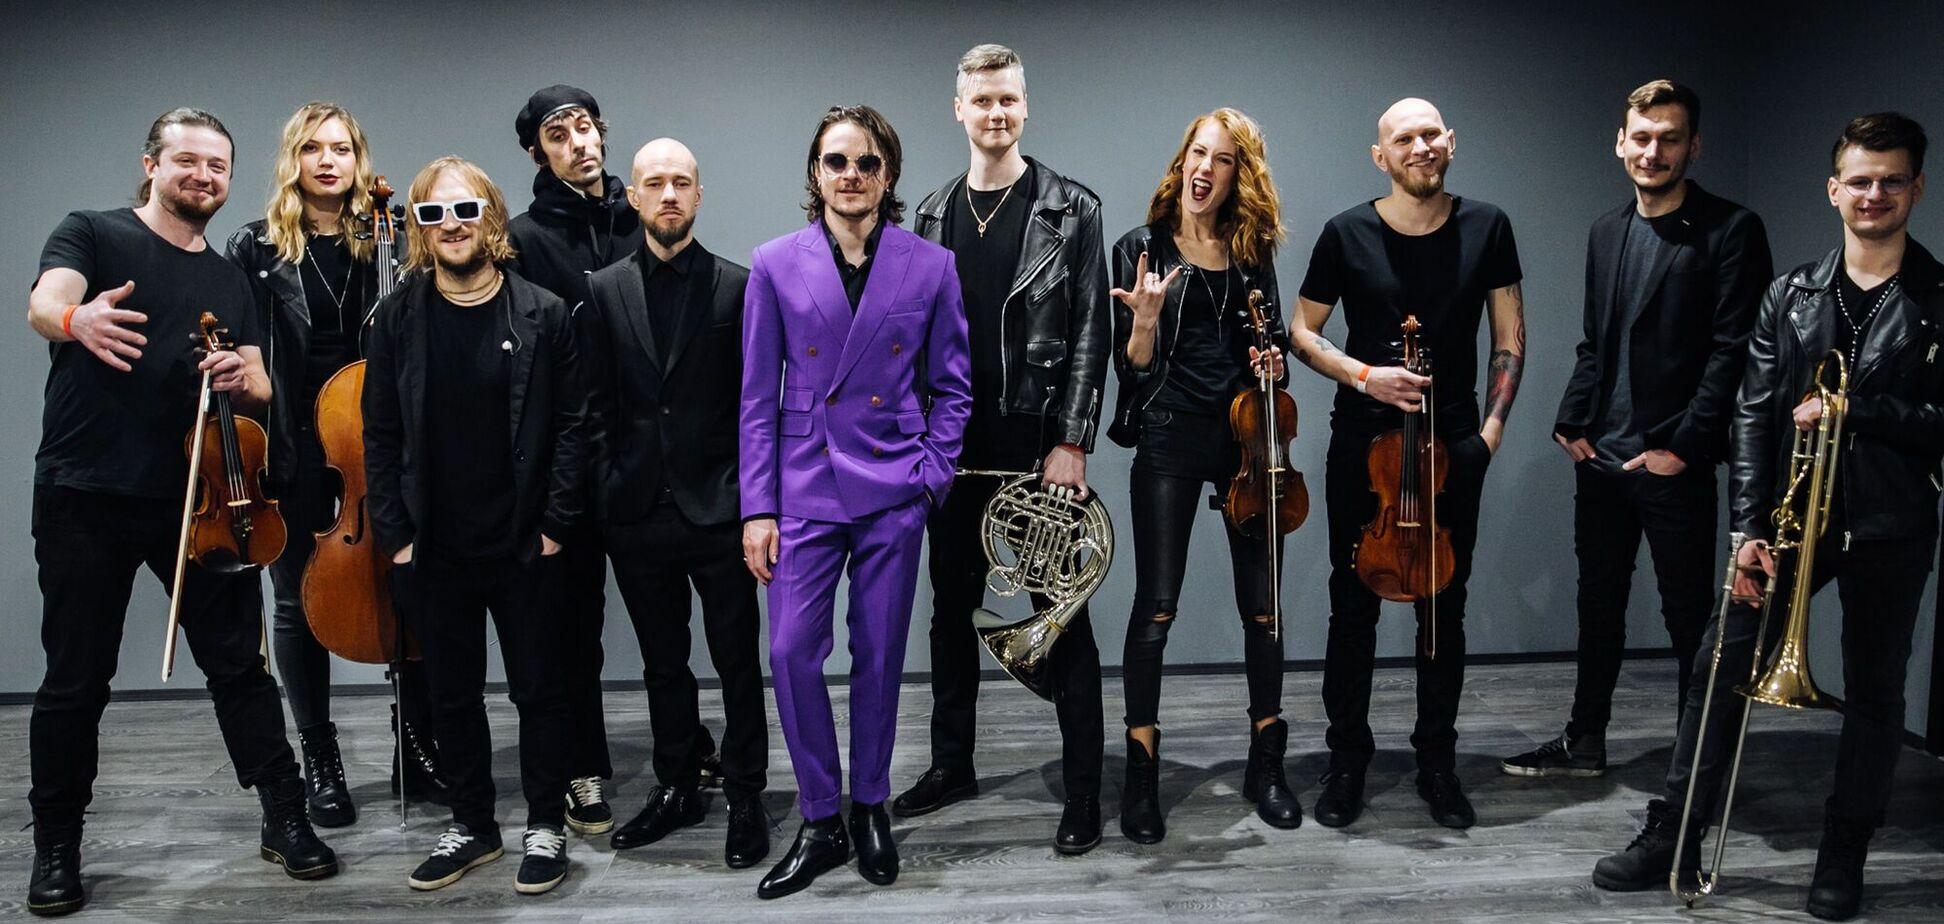 O.Torvald вышли на сцену Stereo Plaza вместе с VP Orchestra